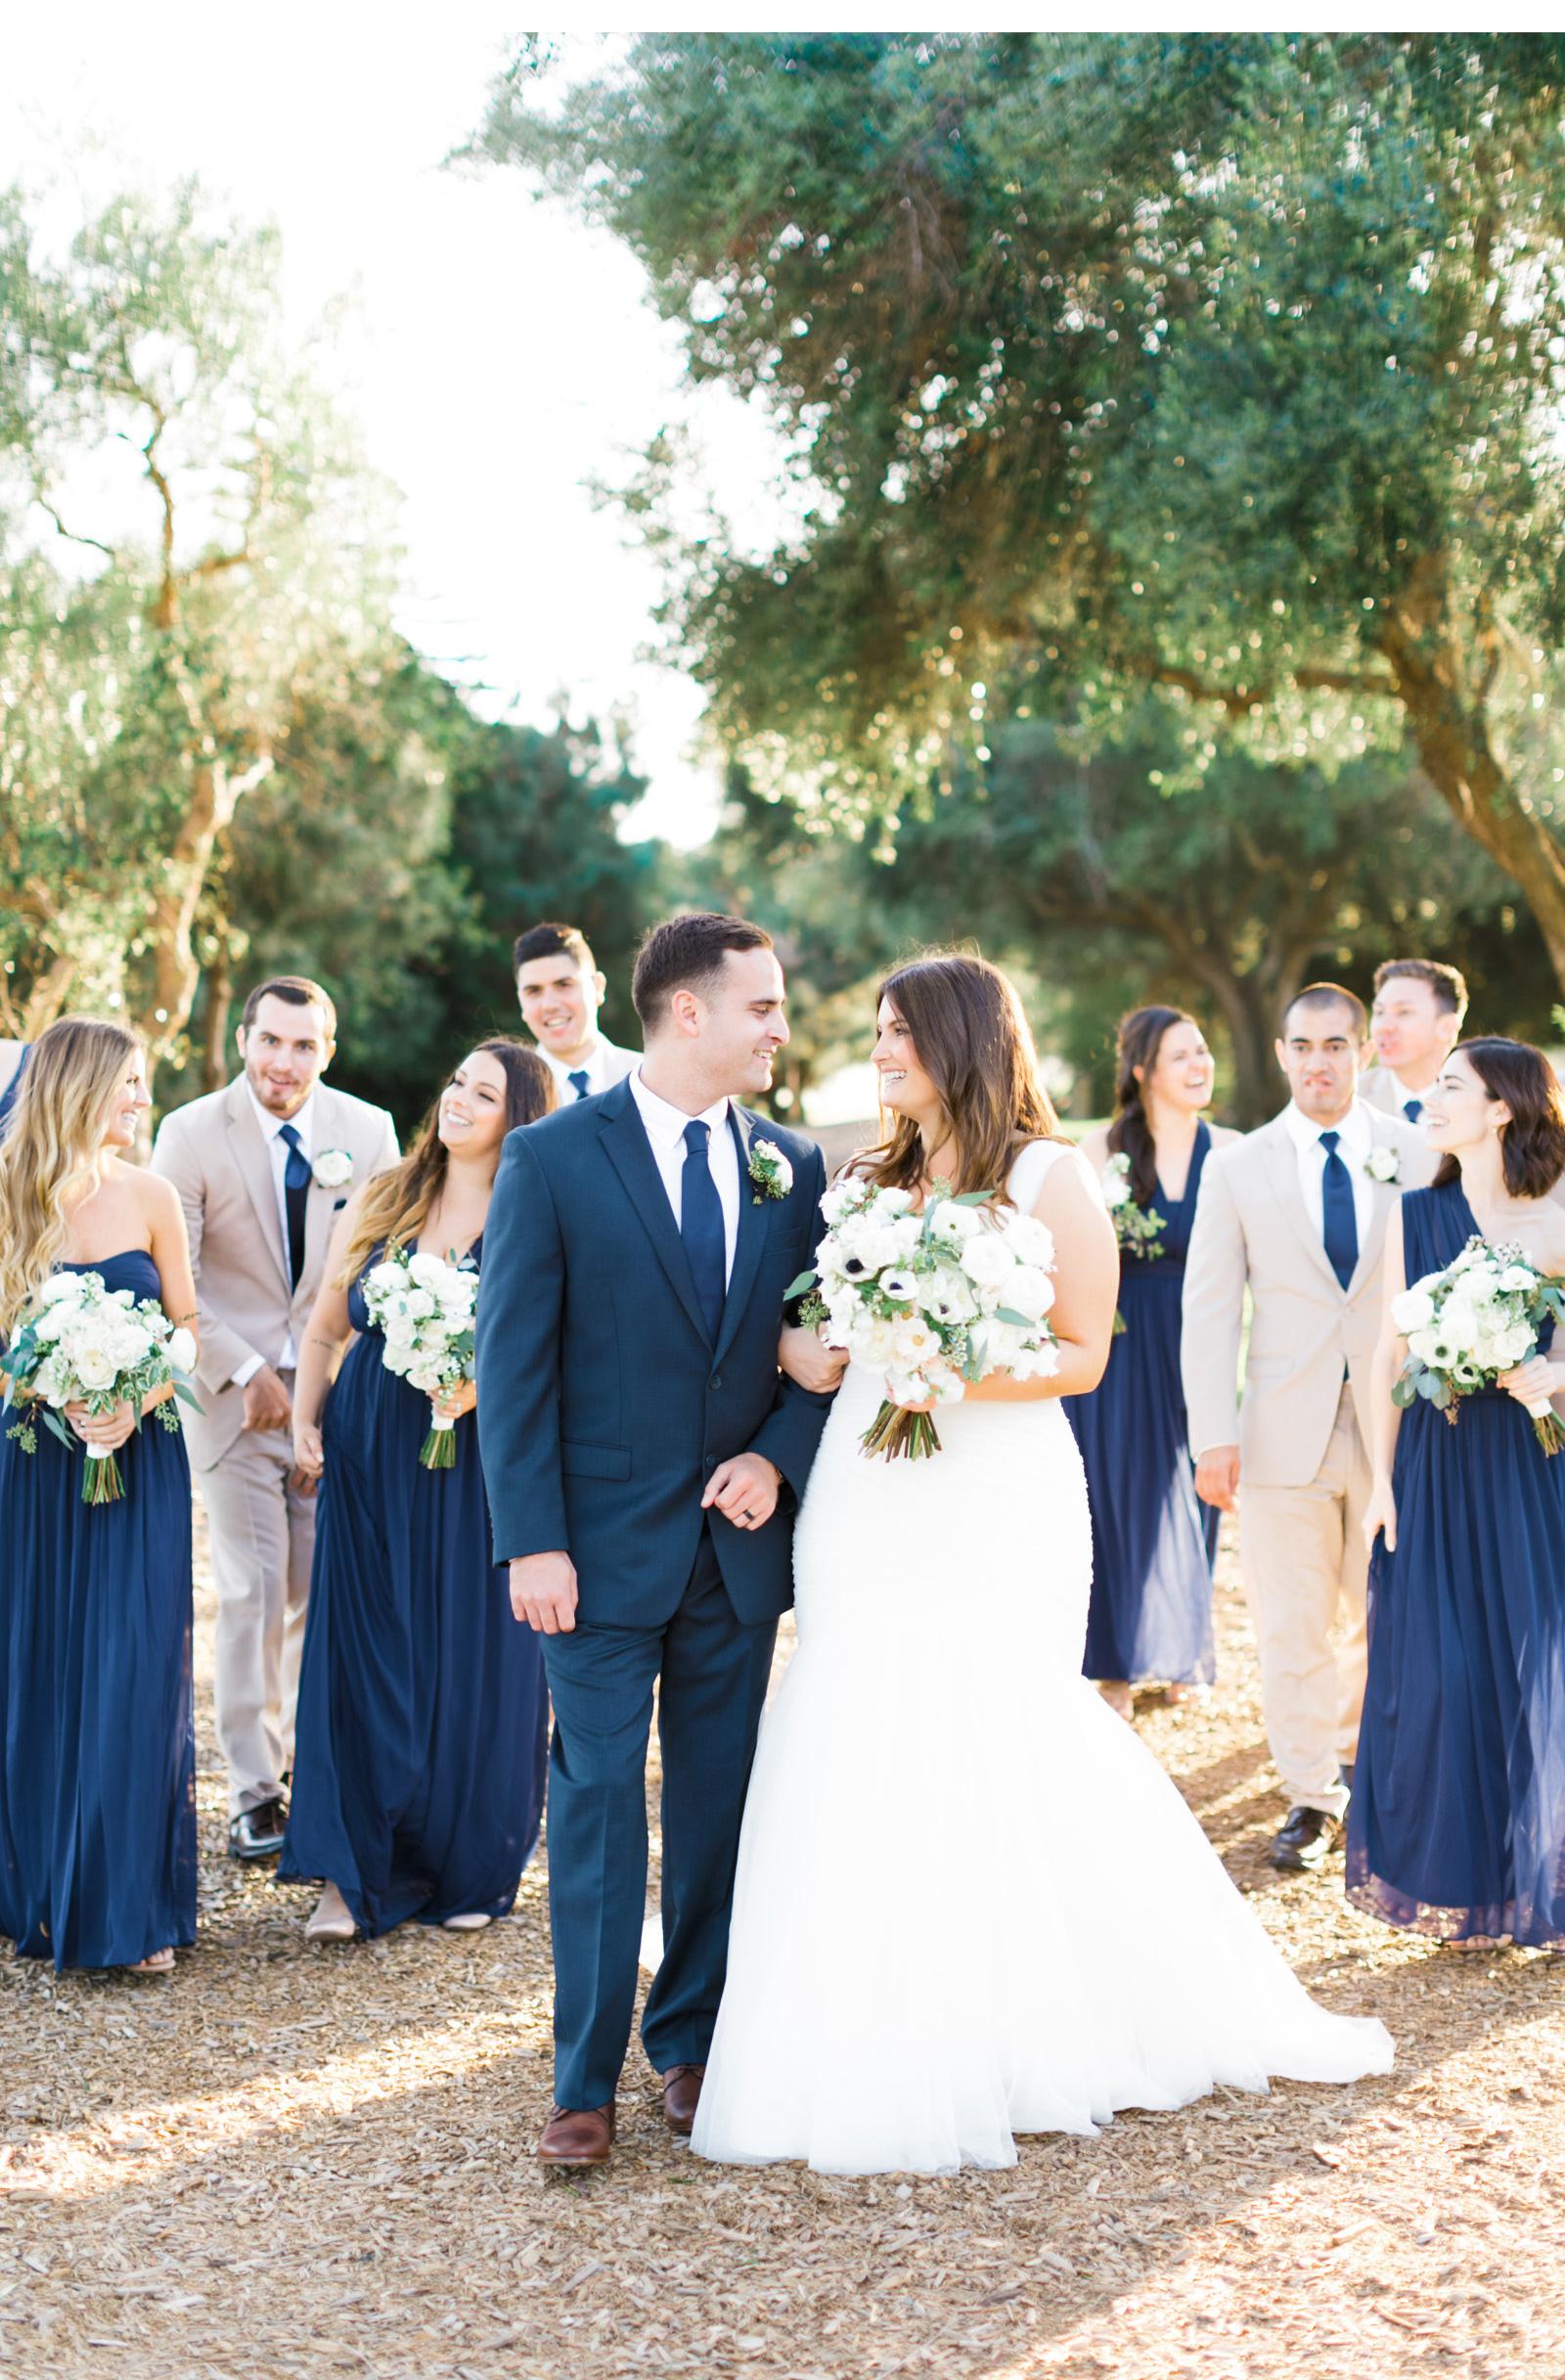 San-Luis-Obispo-Wedding-Natalie-Schutt-Photography_01.jpg